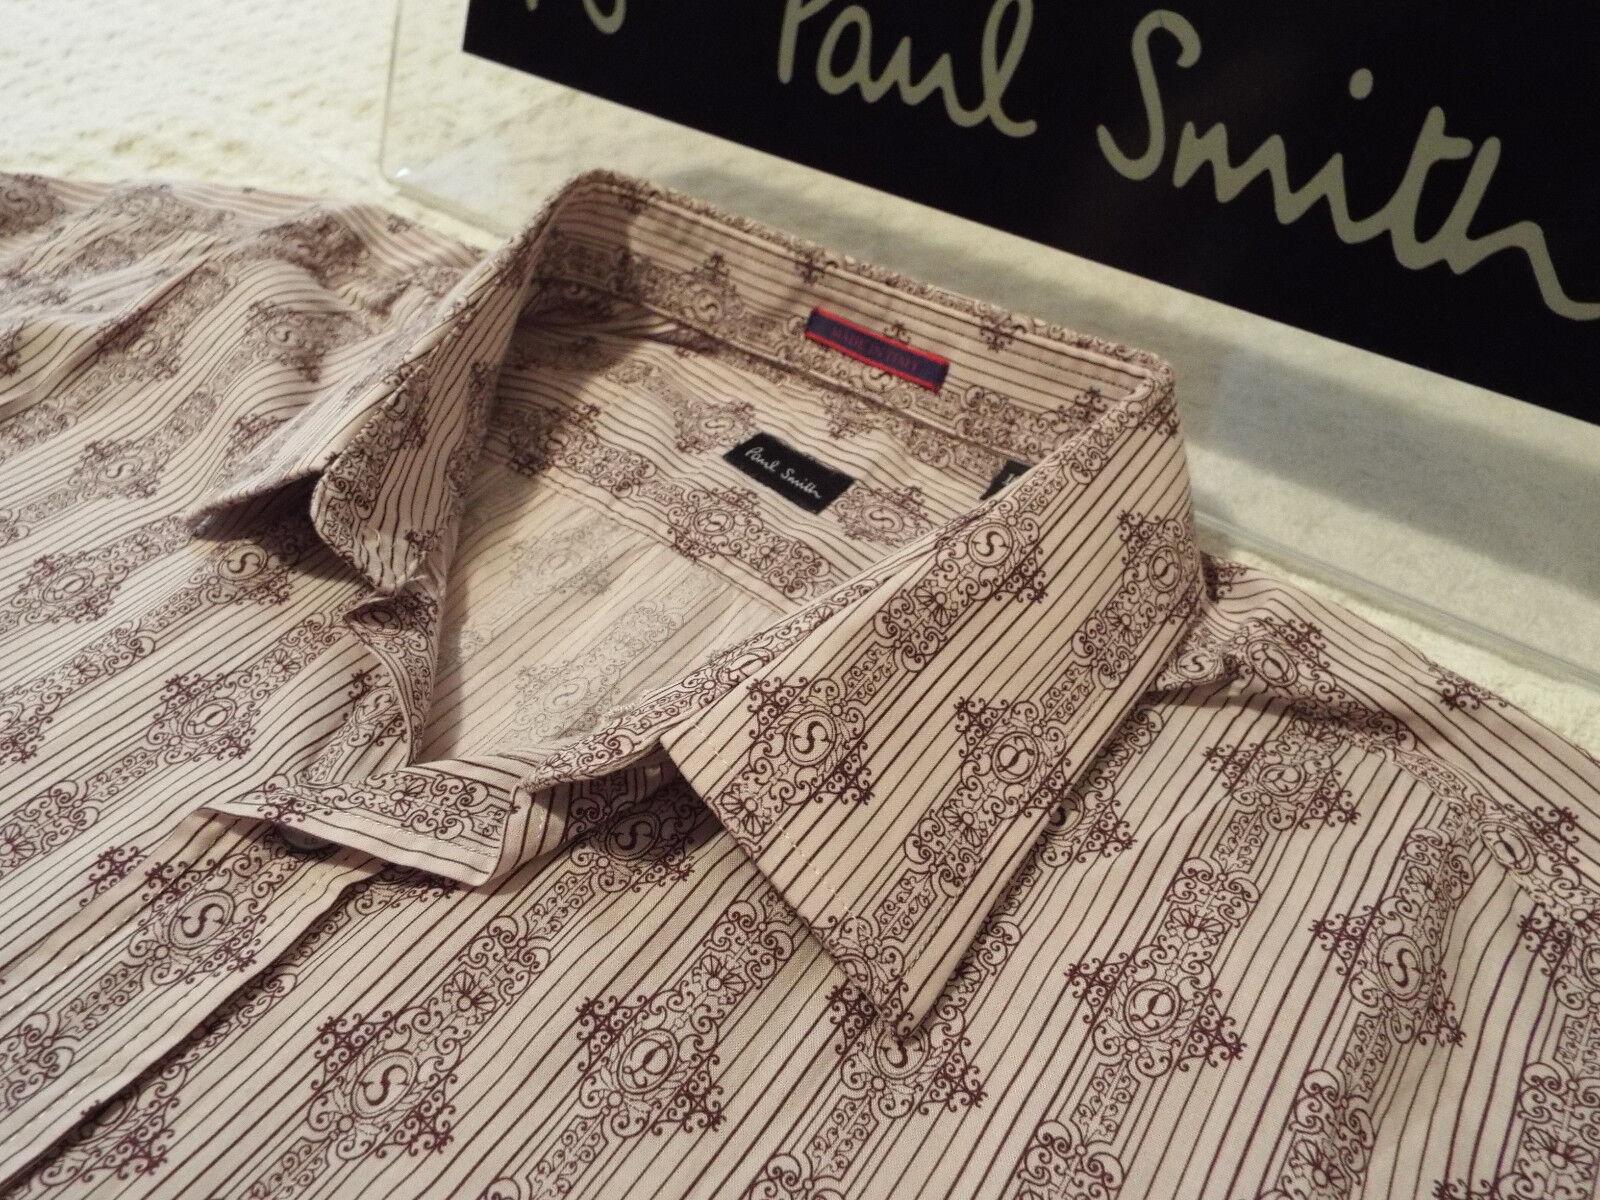 PAUL SMITH Mens Shirt  Size 16.5